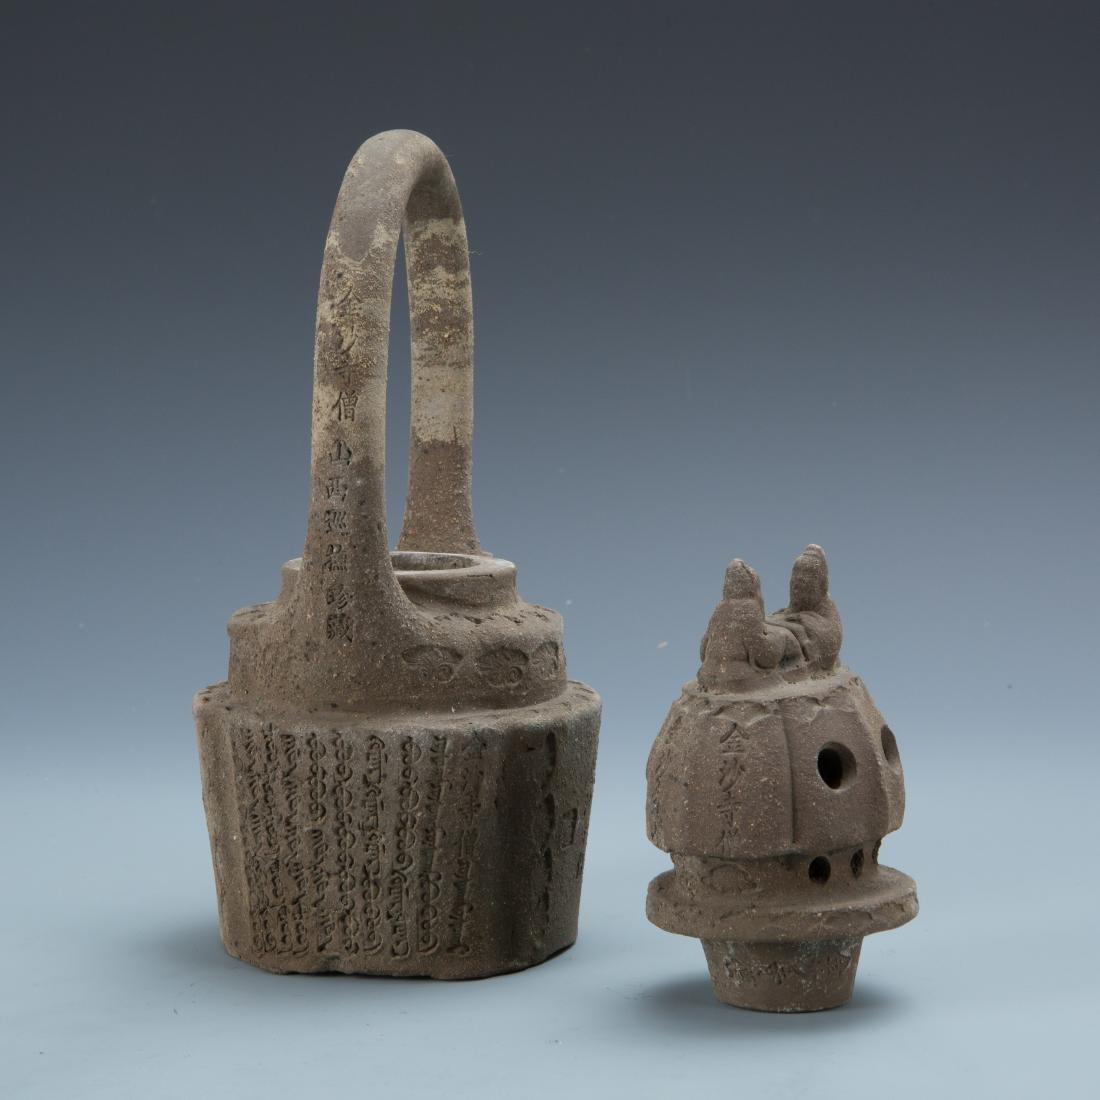 Estate Sale: Opium Pipe Carved Wood Statue Tea Pot - 3